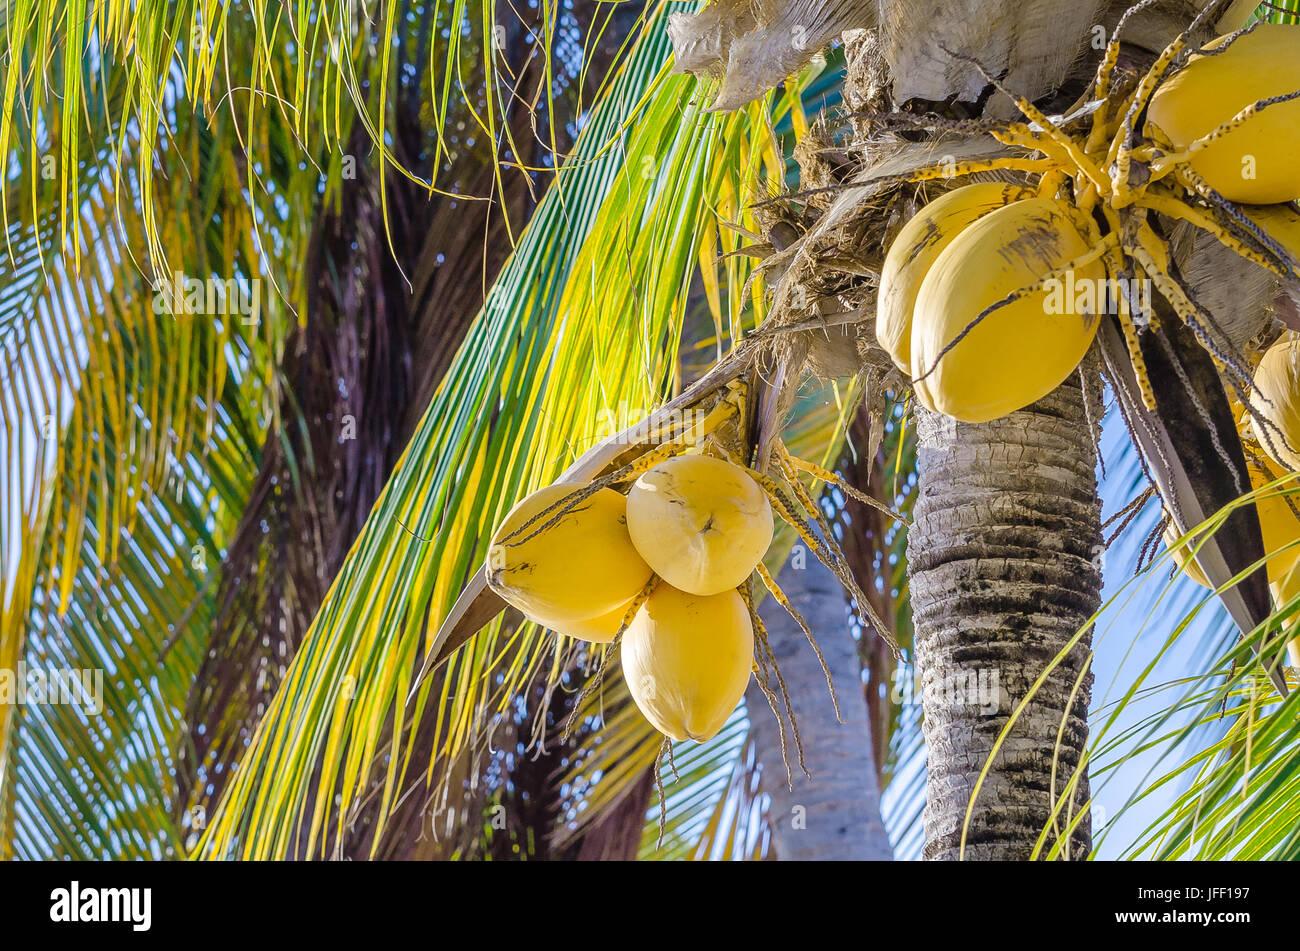 Coconut palm tree at the mambo beach - Stock Image